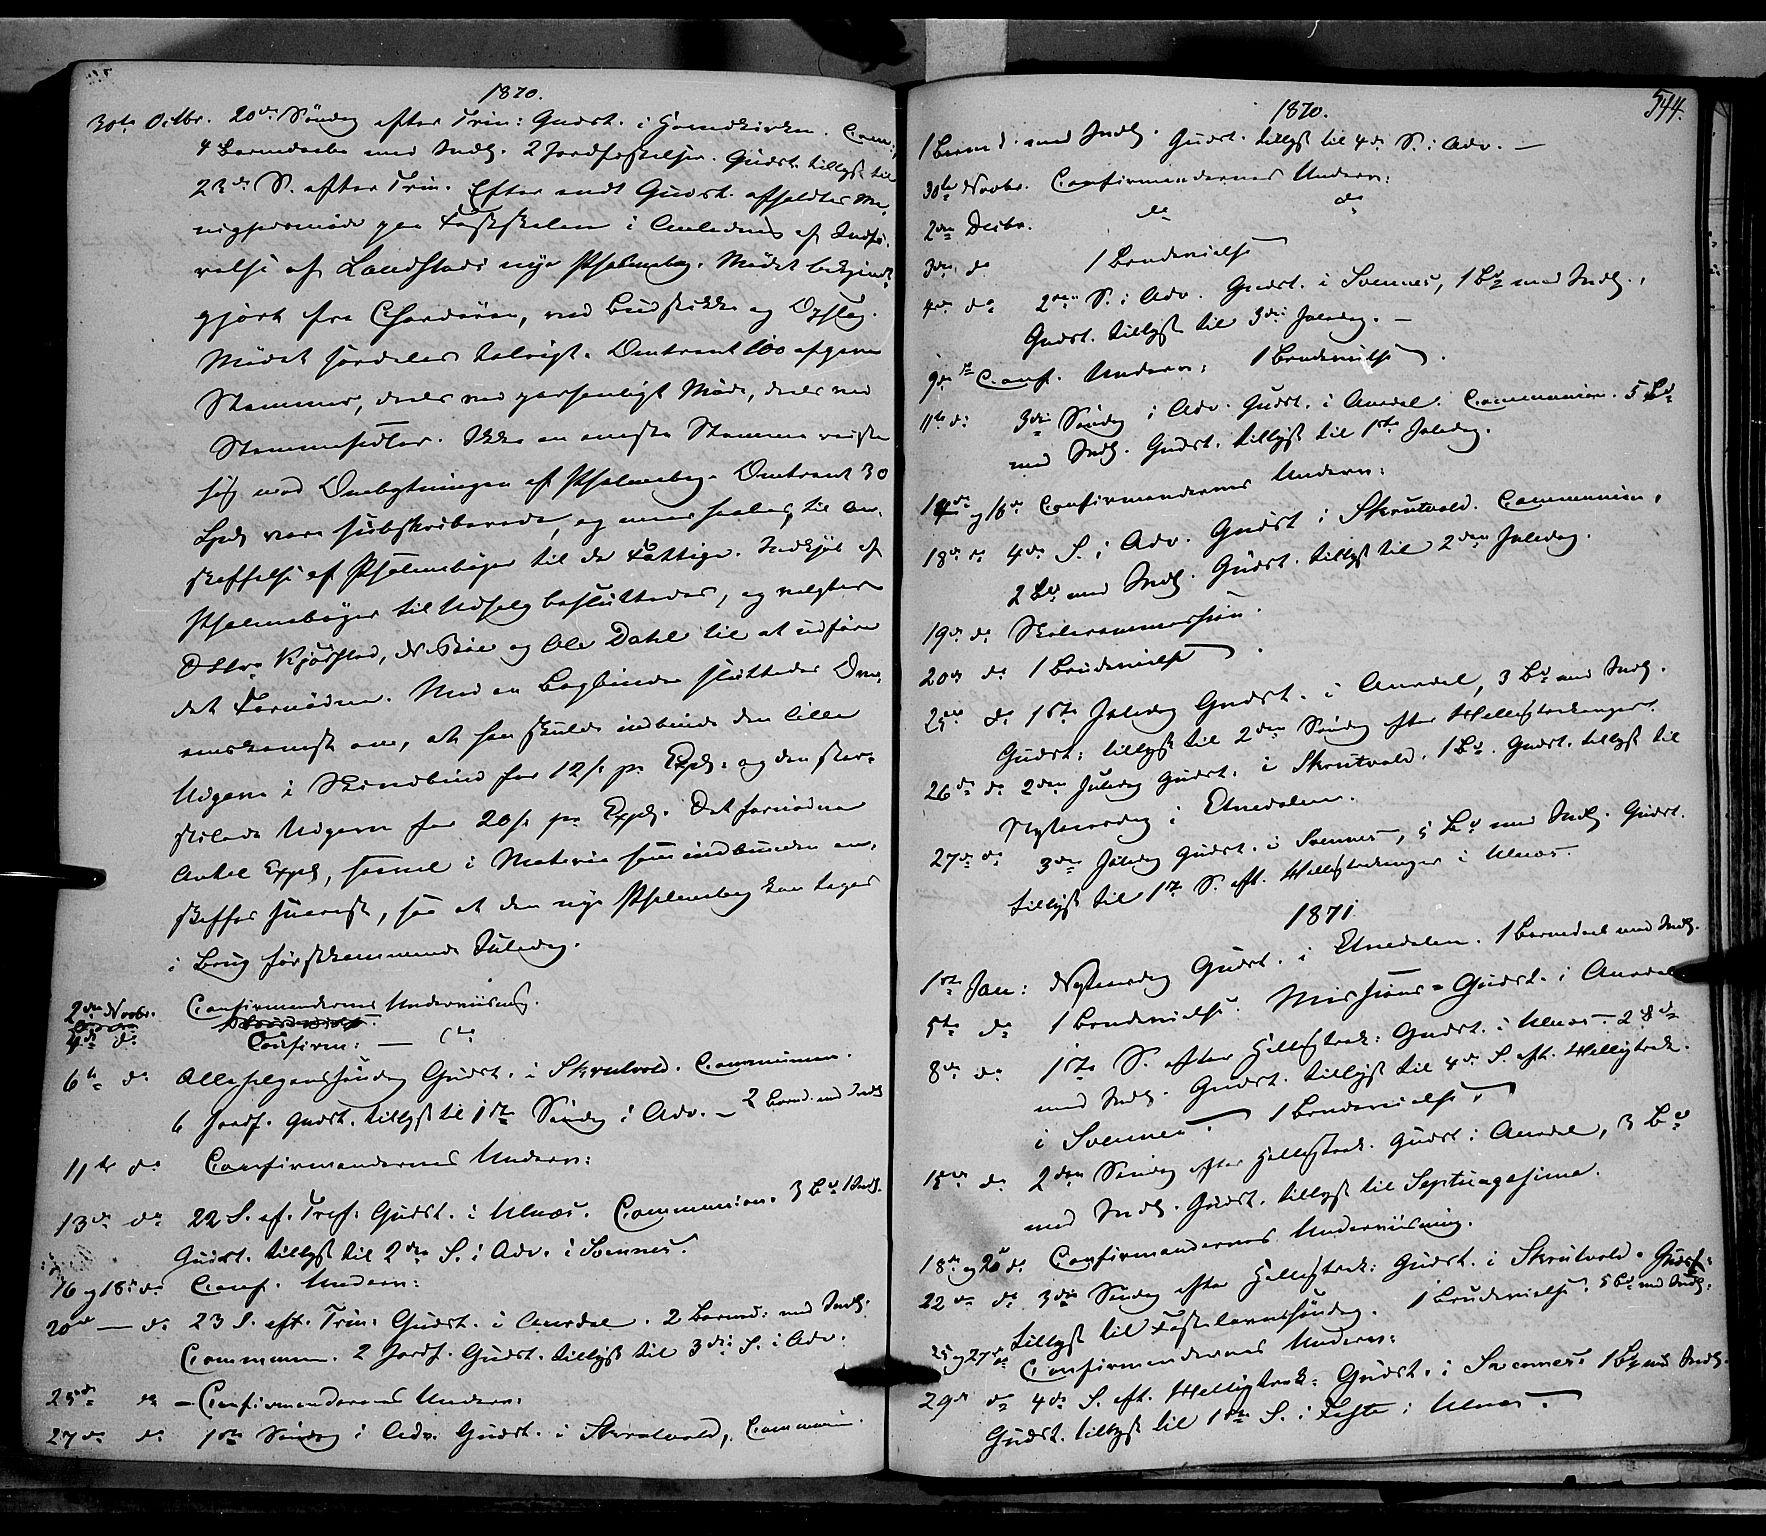 SAH, Nord-Aurdal prestekontor, Ministerialbok nr. 8, 1863-1875, s. 544